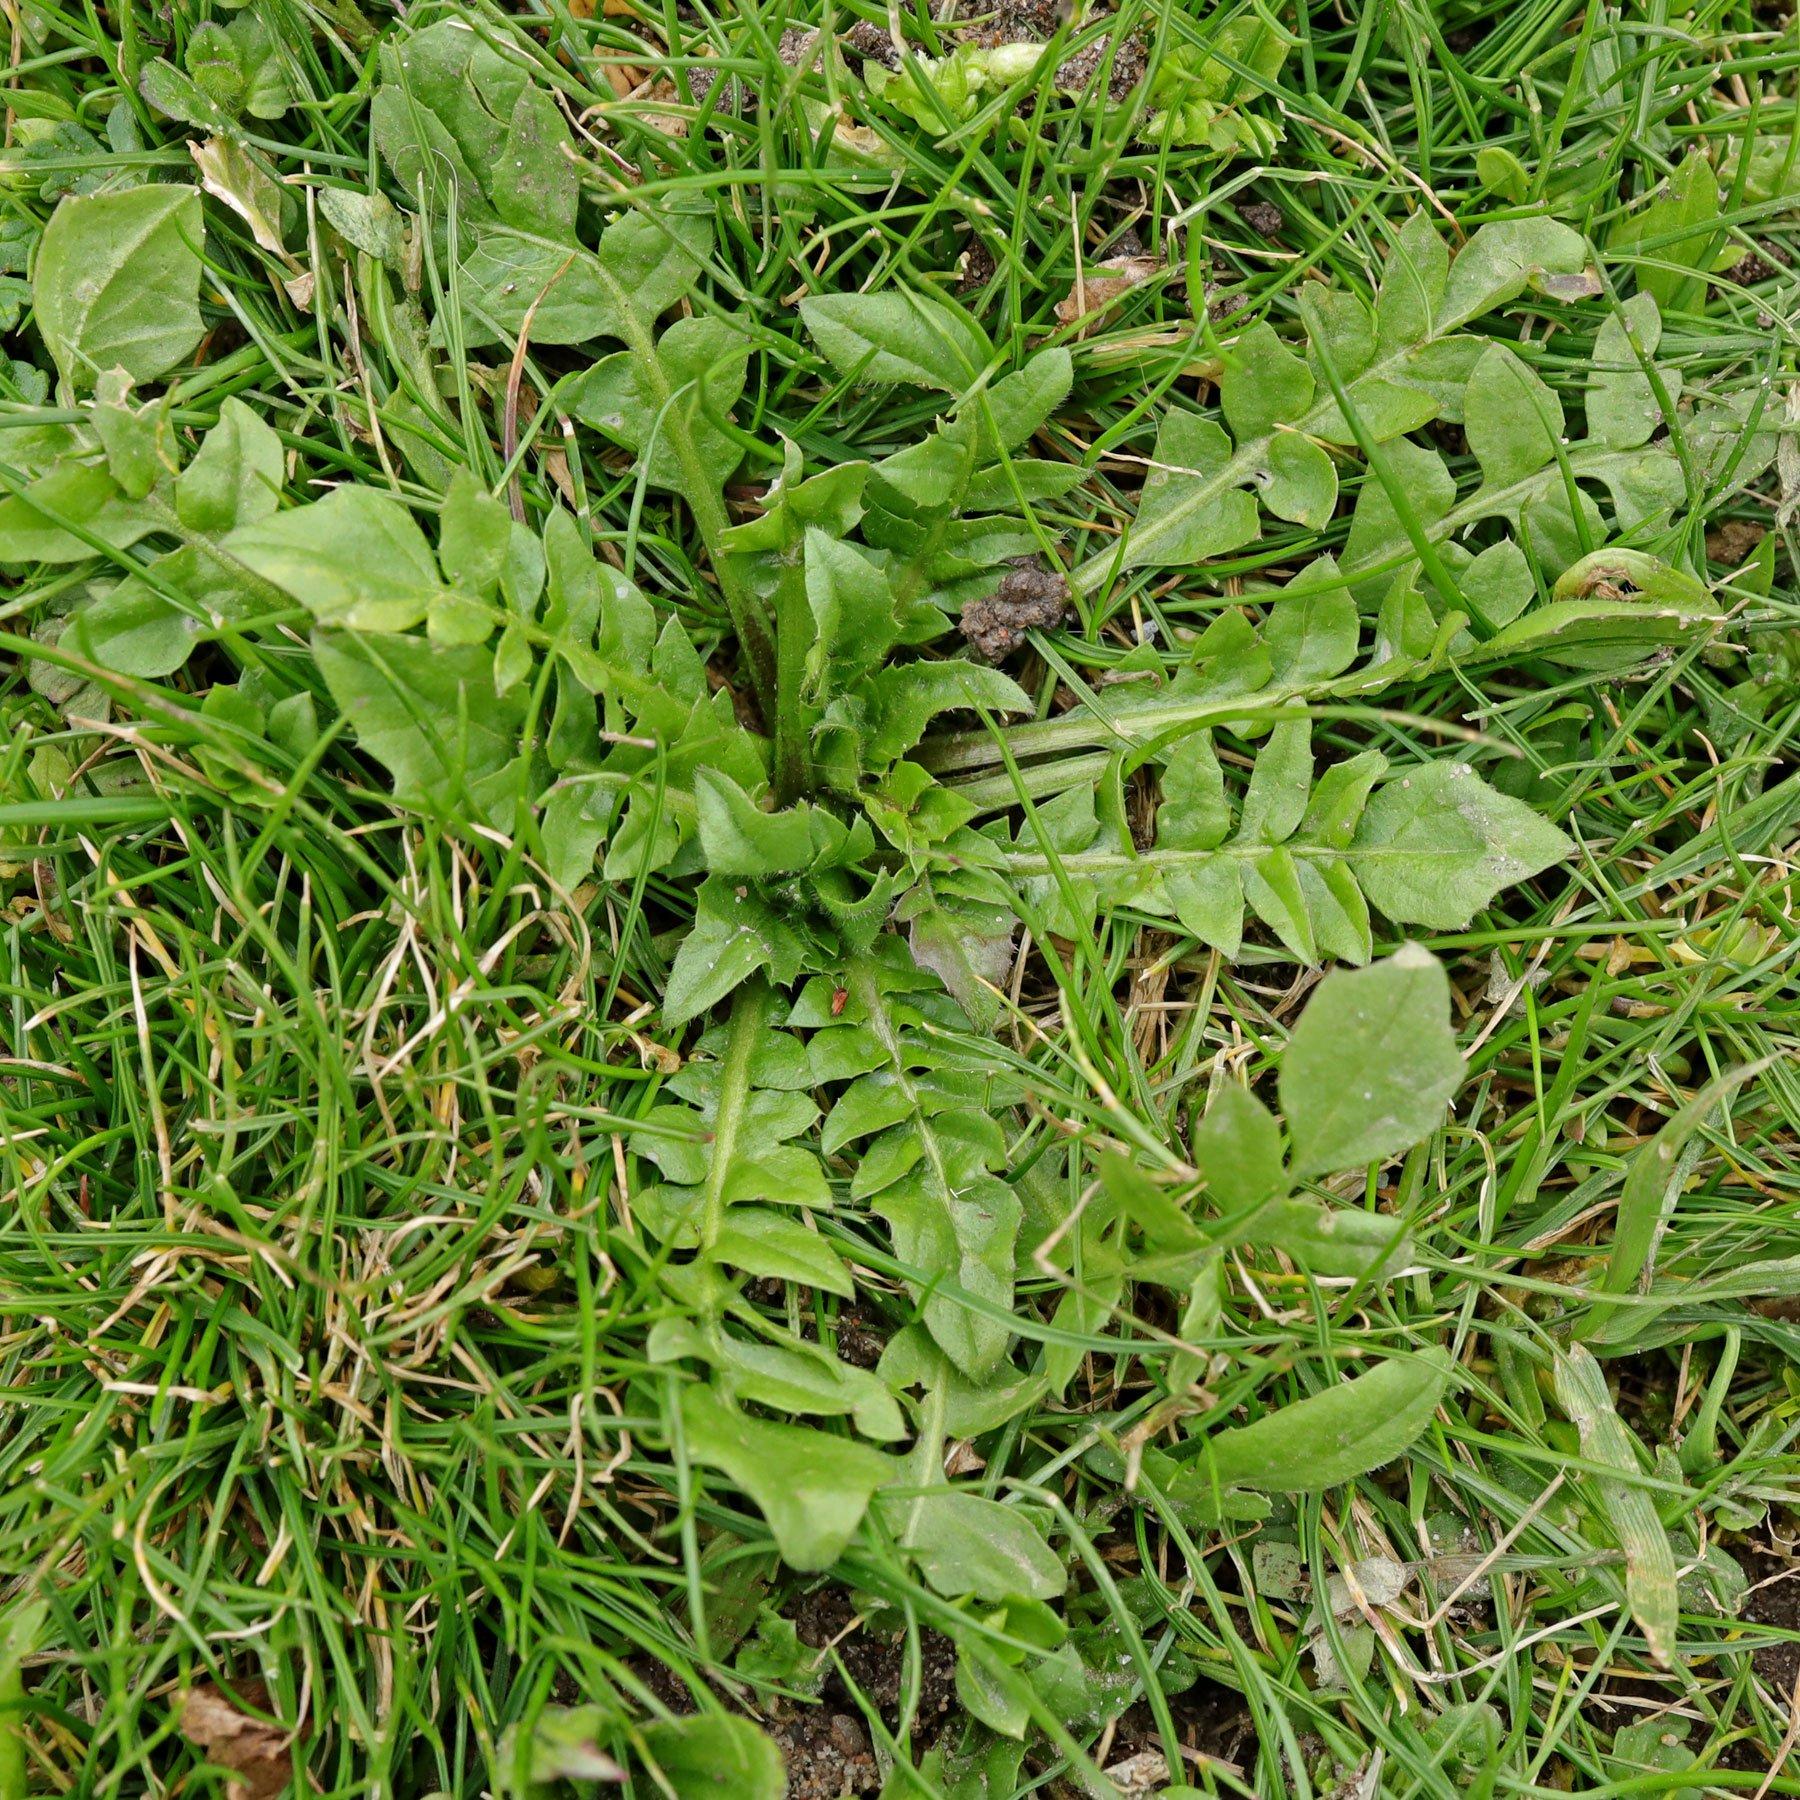 Hirtentaeschel im Rasen